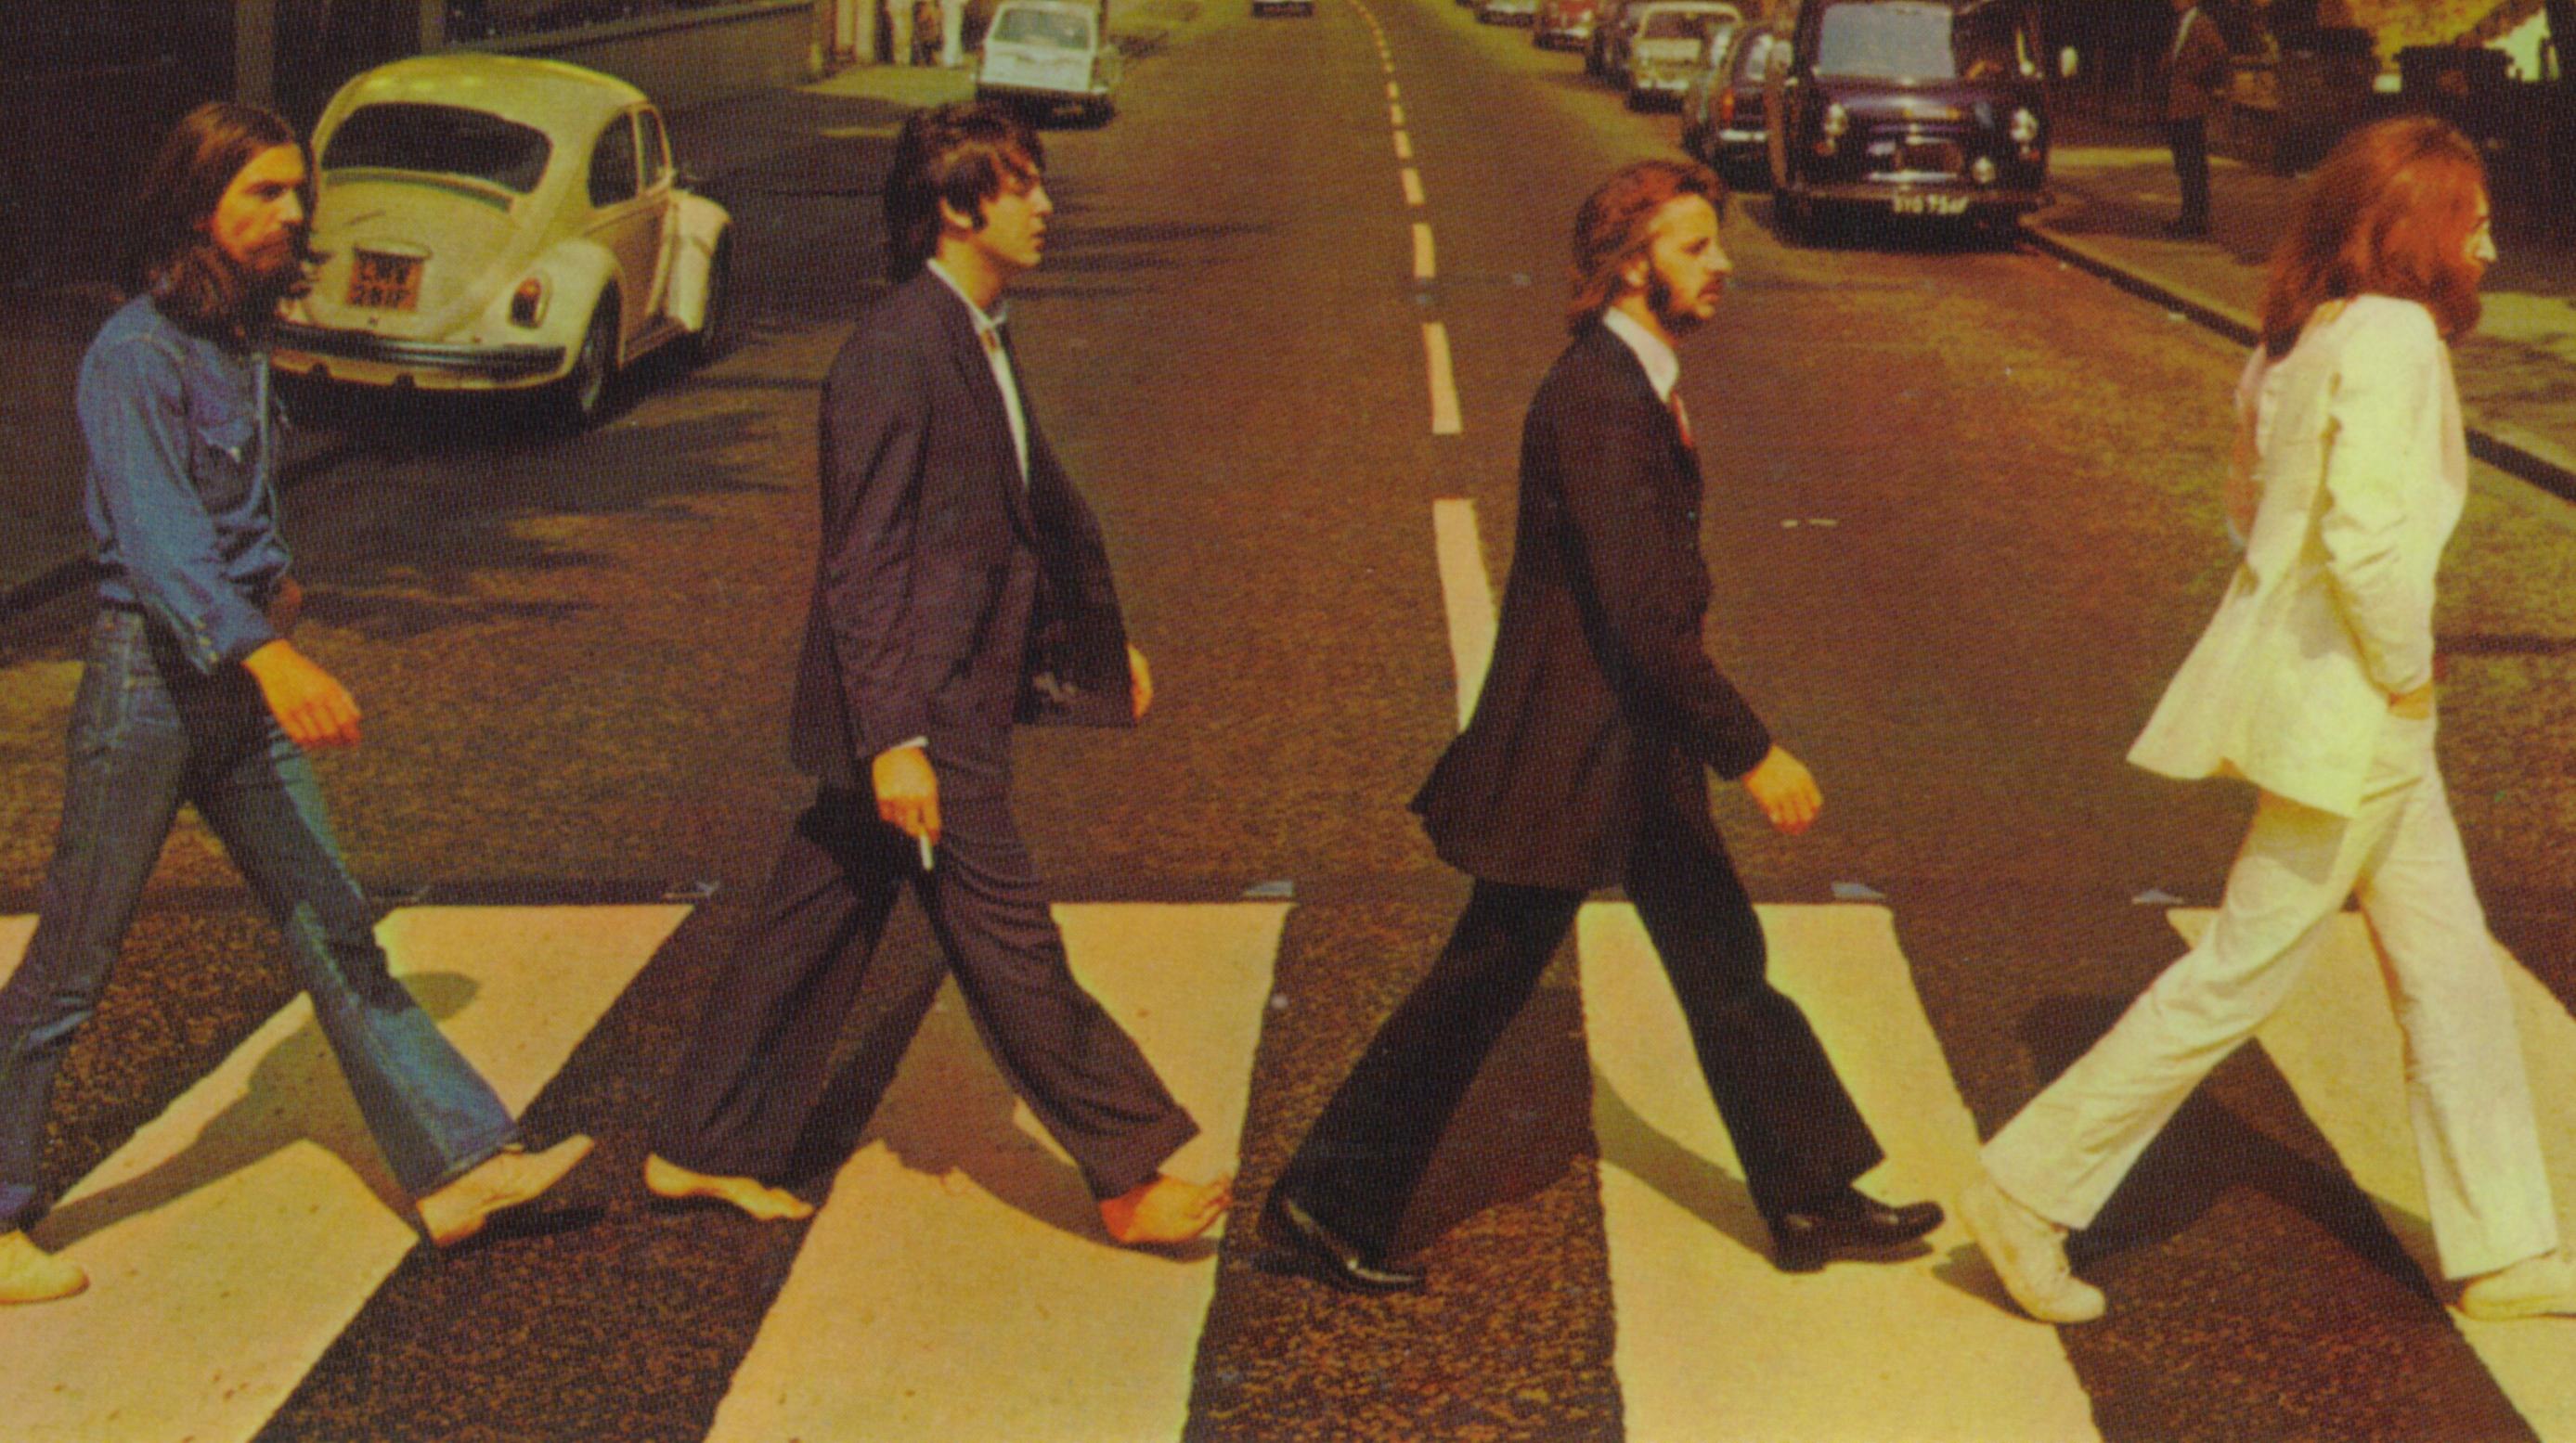 В Каком Году Был Выпущен Альбом Группы The Beatles Abbey Road?